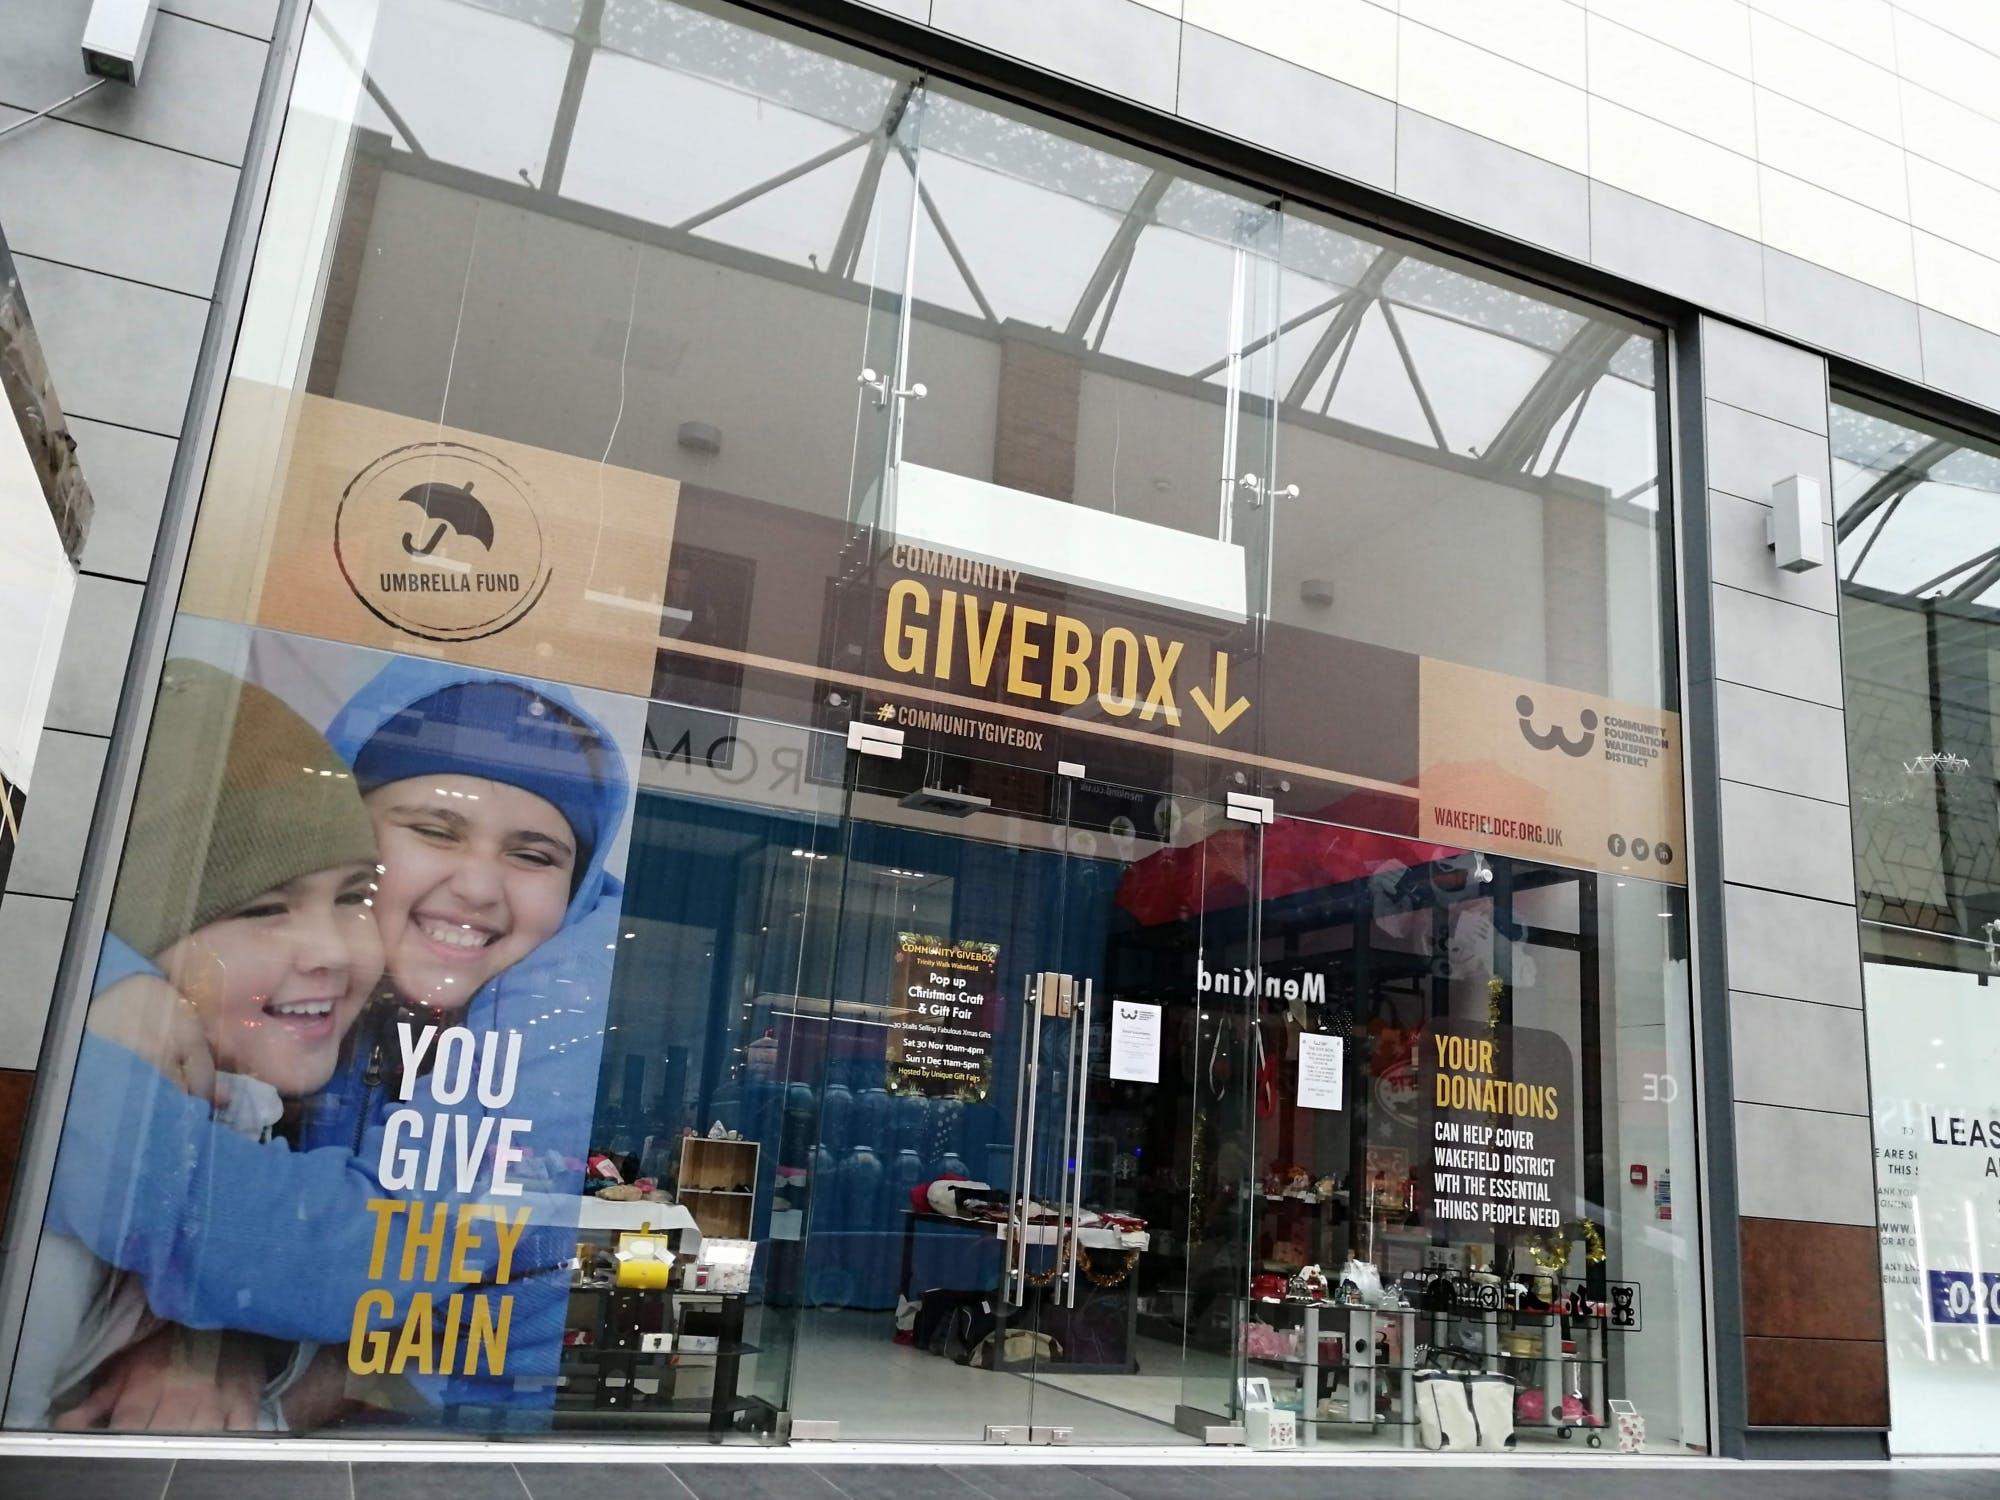 Community_GIVE_BOX